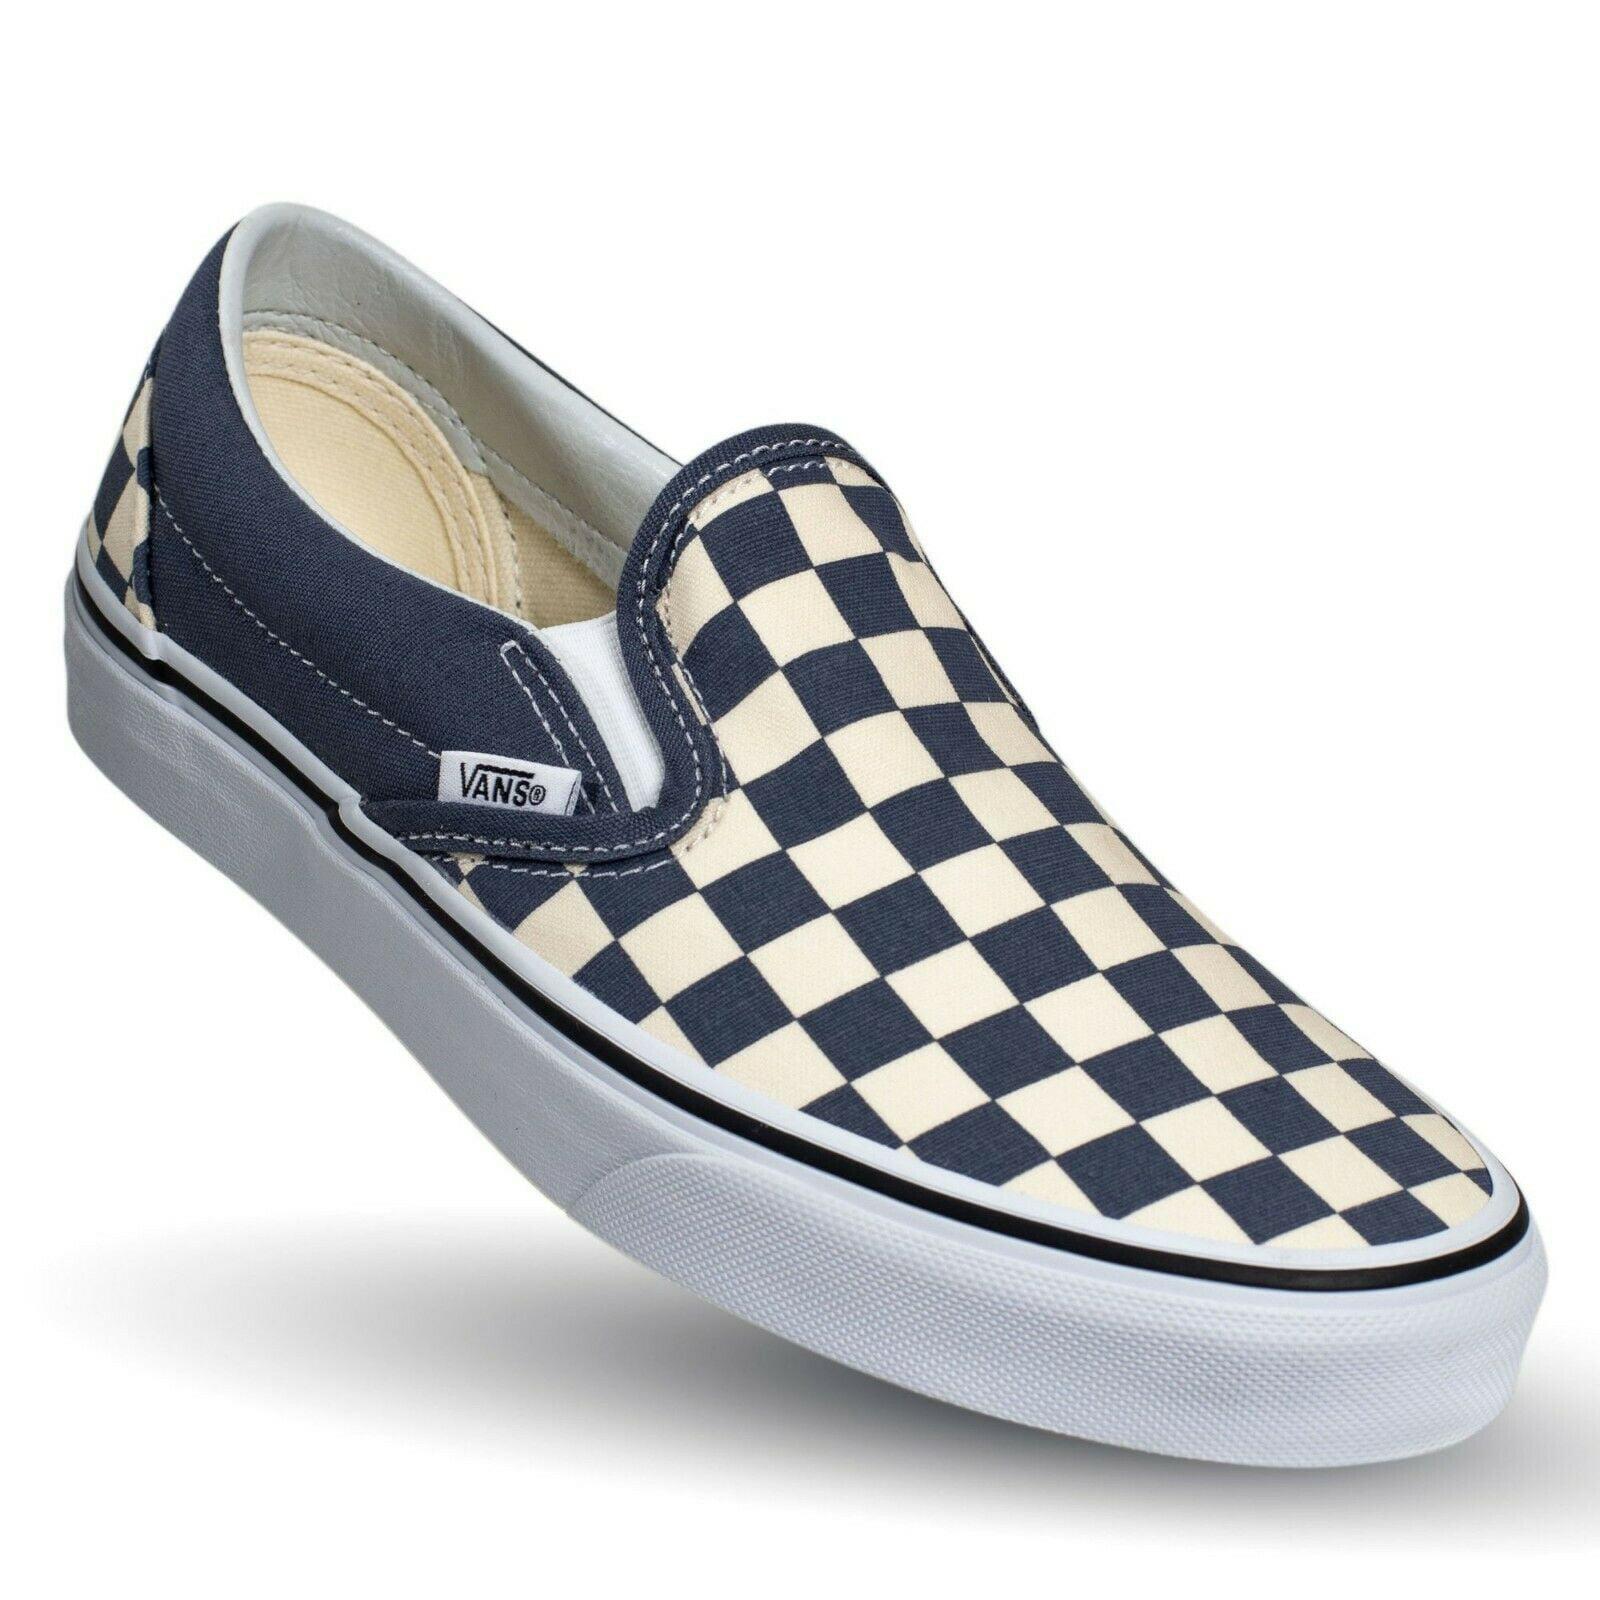 Vans - Vans Classic Slip On Checkerboard Grisaille Men's Classic Skate Shoes Size 10 - Walmart.com